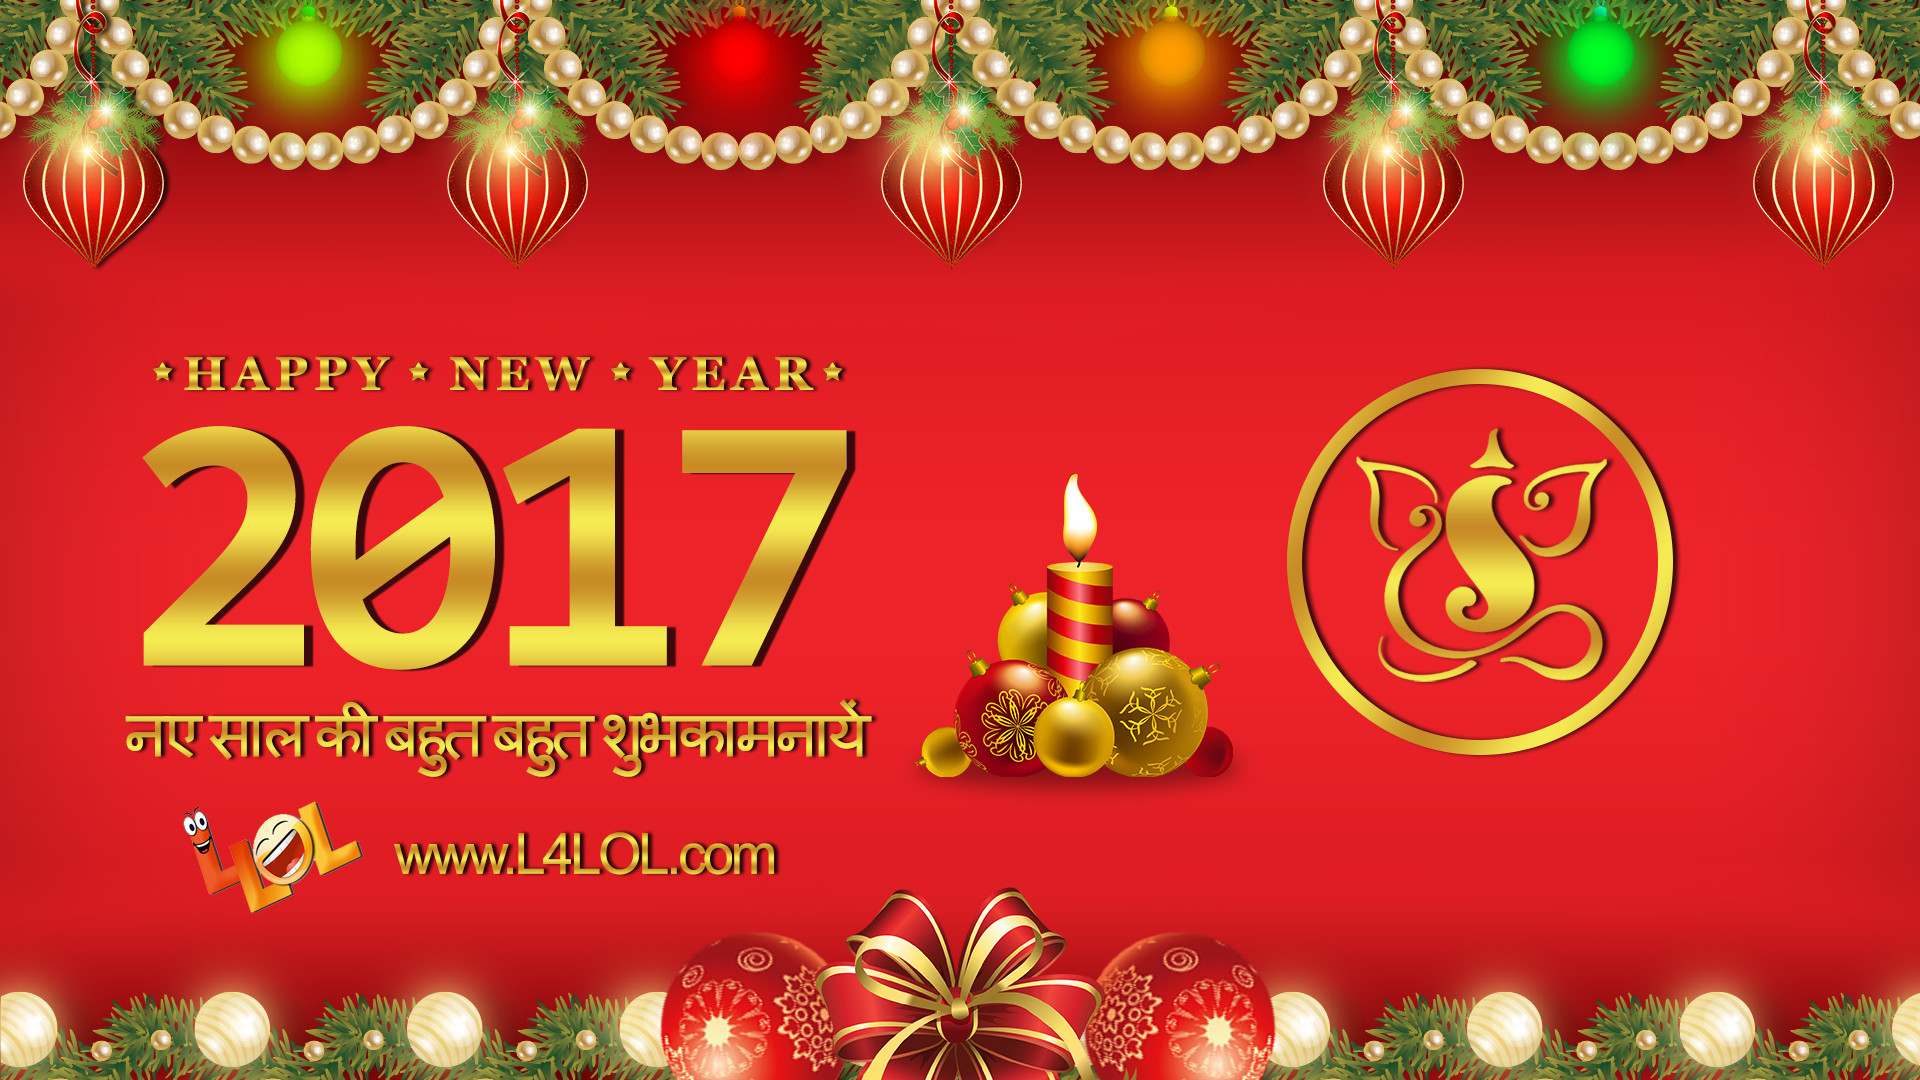 Happy New Year Wallpapers 2017 : https://www.festivalworldz.com/